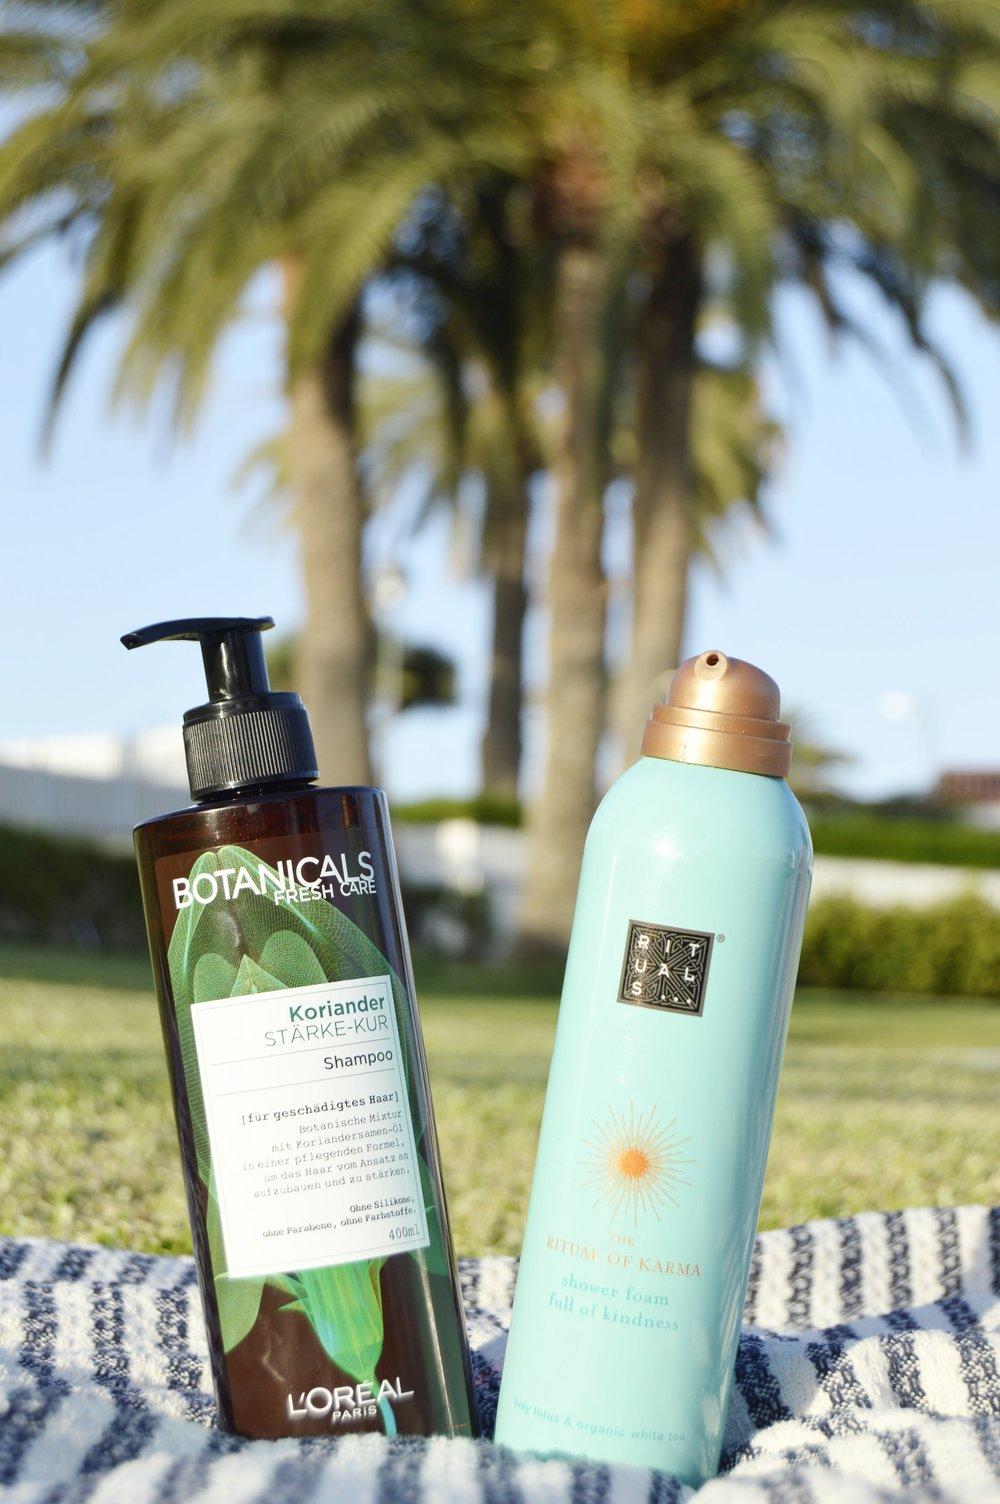 Beauty-Blog-Review-Erfahrung-Rituals-Loreal-Urlaub-Produkte